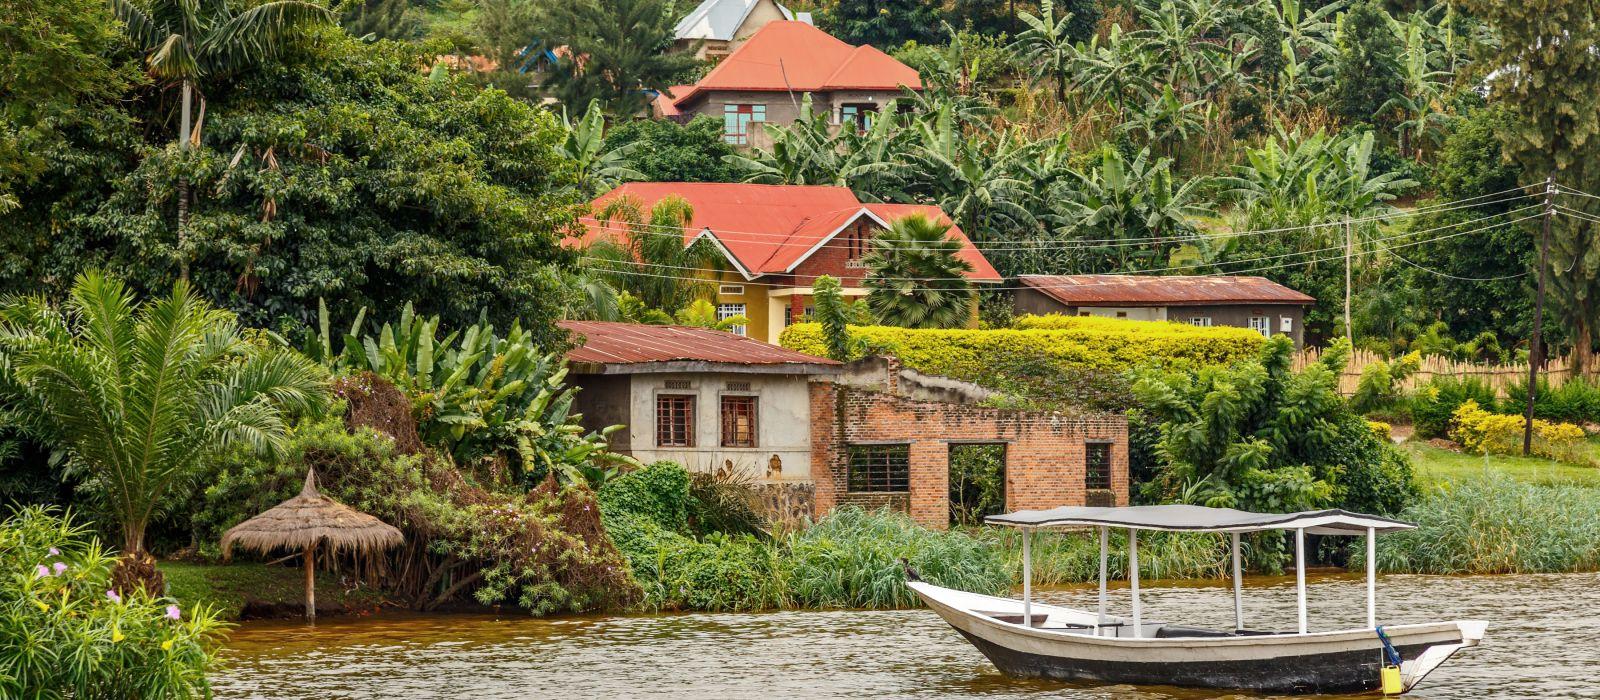 Roof boat anchored at the coast with rwandan village in the background, Kivu lake, Rwanda